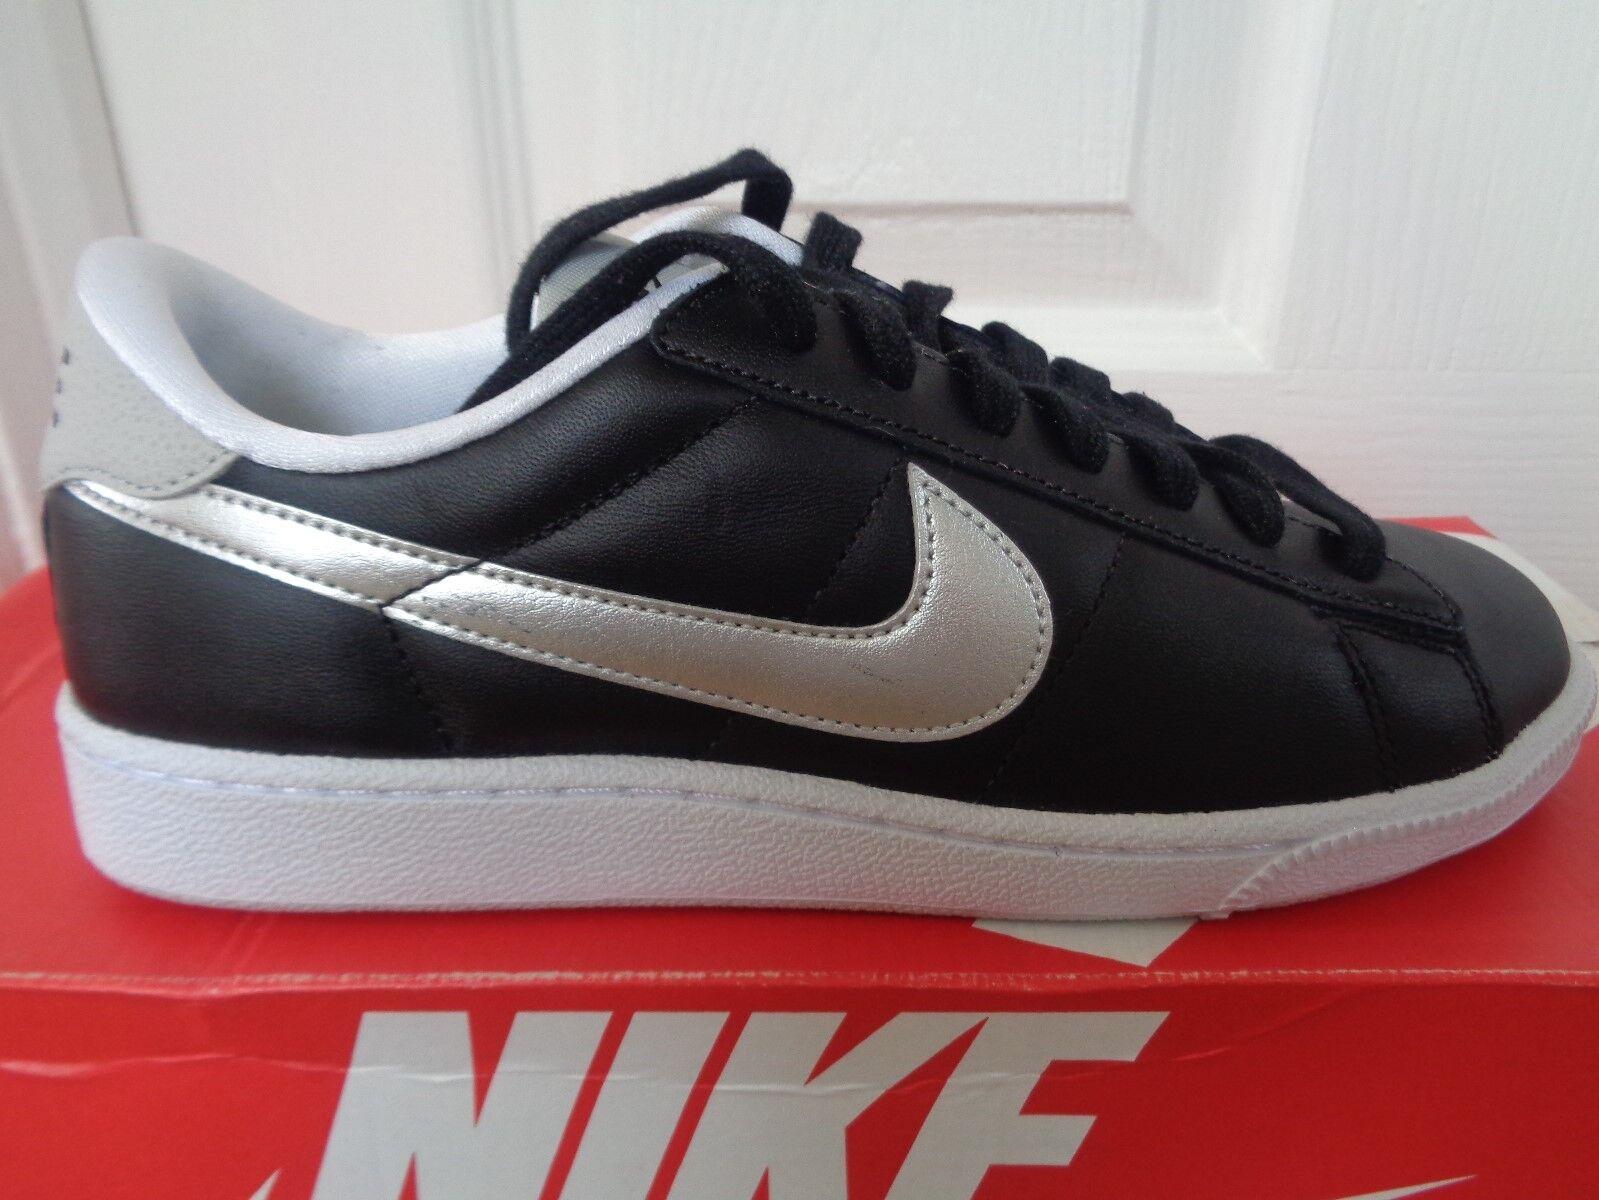 Nike Tennis Classic Scarpe Da Da Da Ginnastica WMNS 312498 005 EU 38.5 US 7.5 Nuovo + Scatola c5d49e